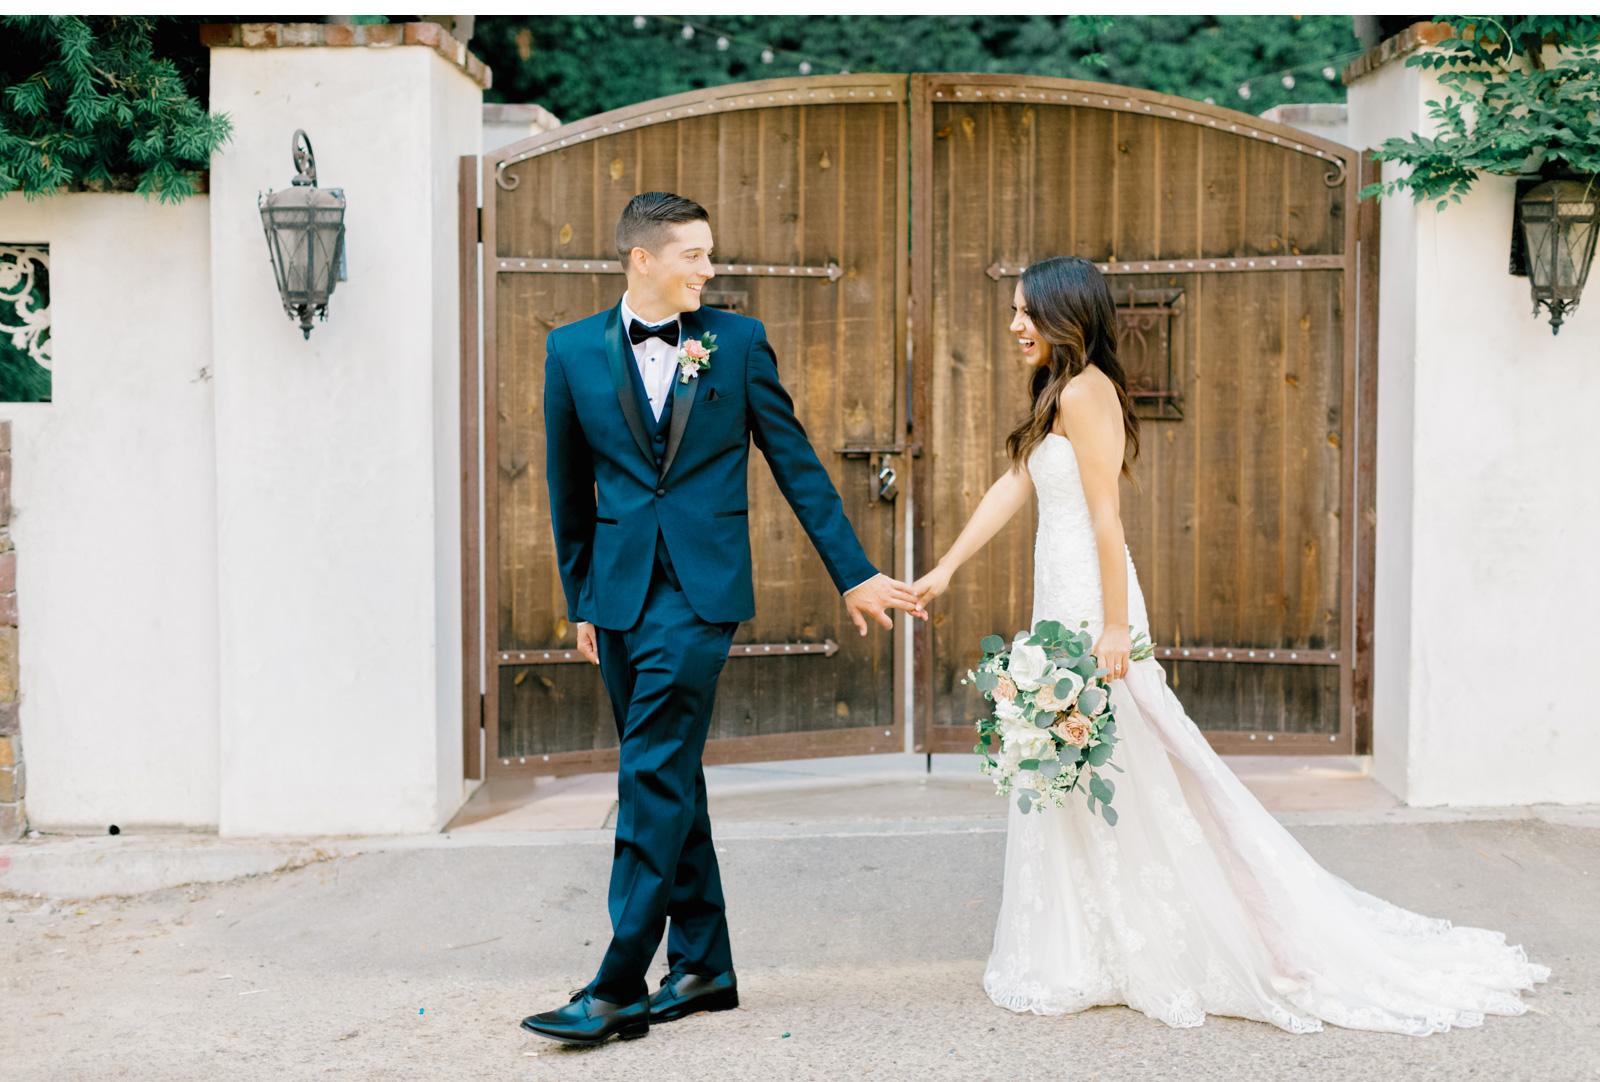 The-Villa-San-Juan-Capistrano-Wedding-Natalie-Schutt-Photography_06.jpg